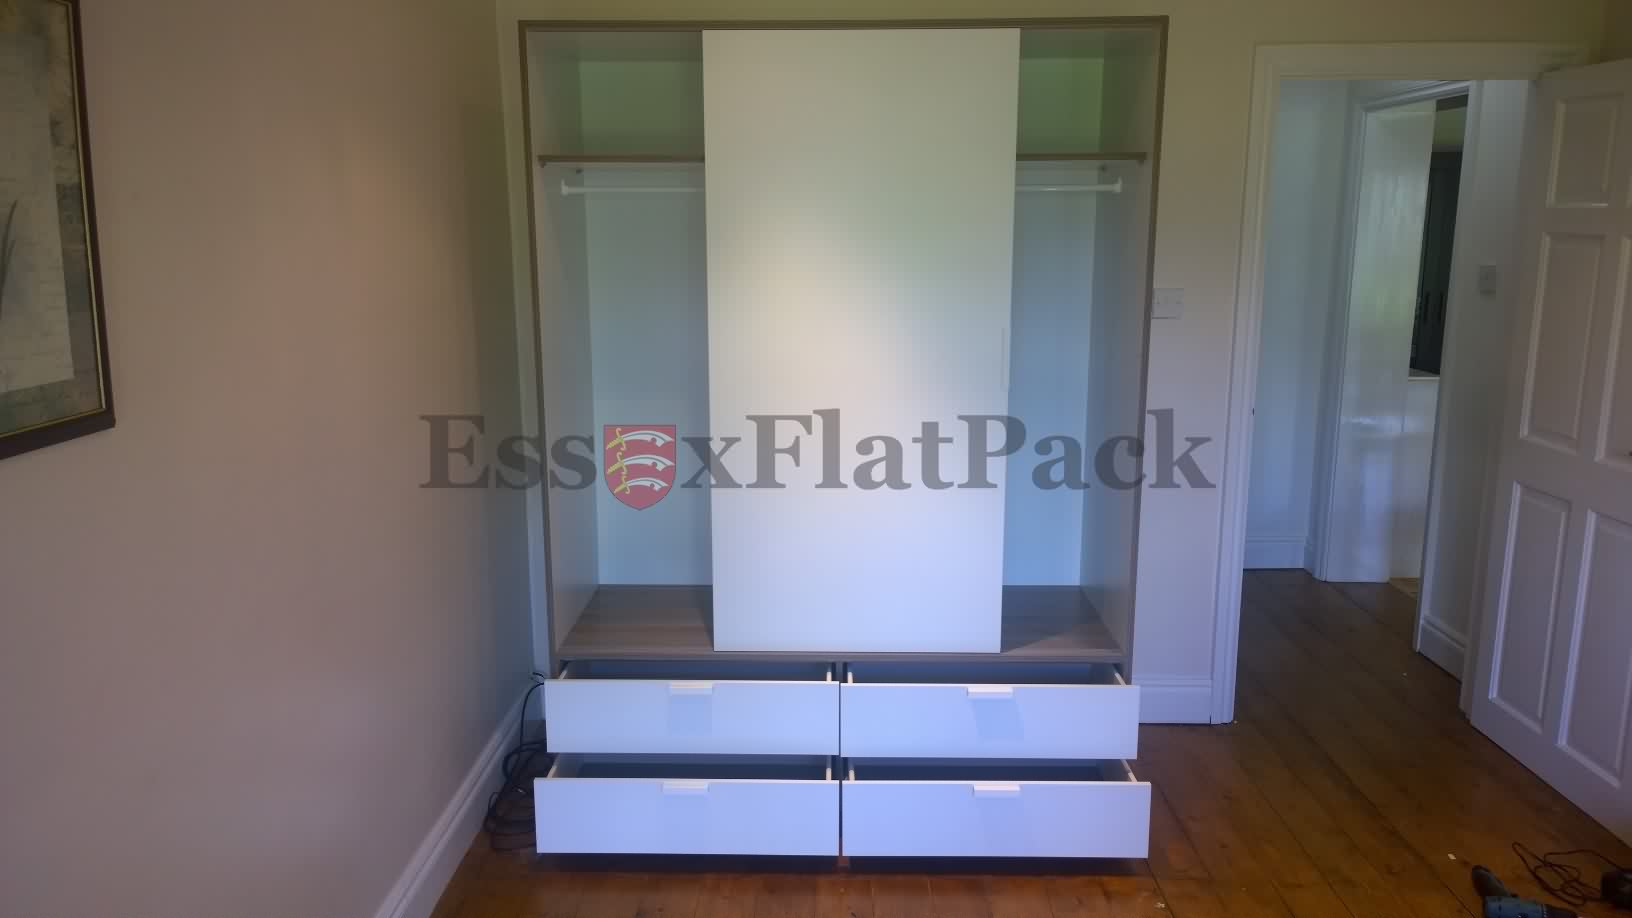 essexflatpack-furniture-20160704105703.jpg